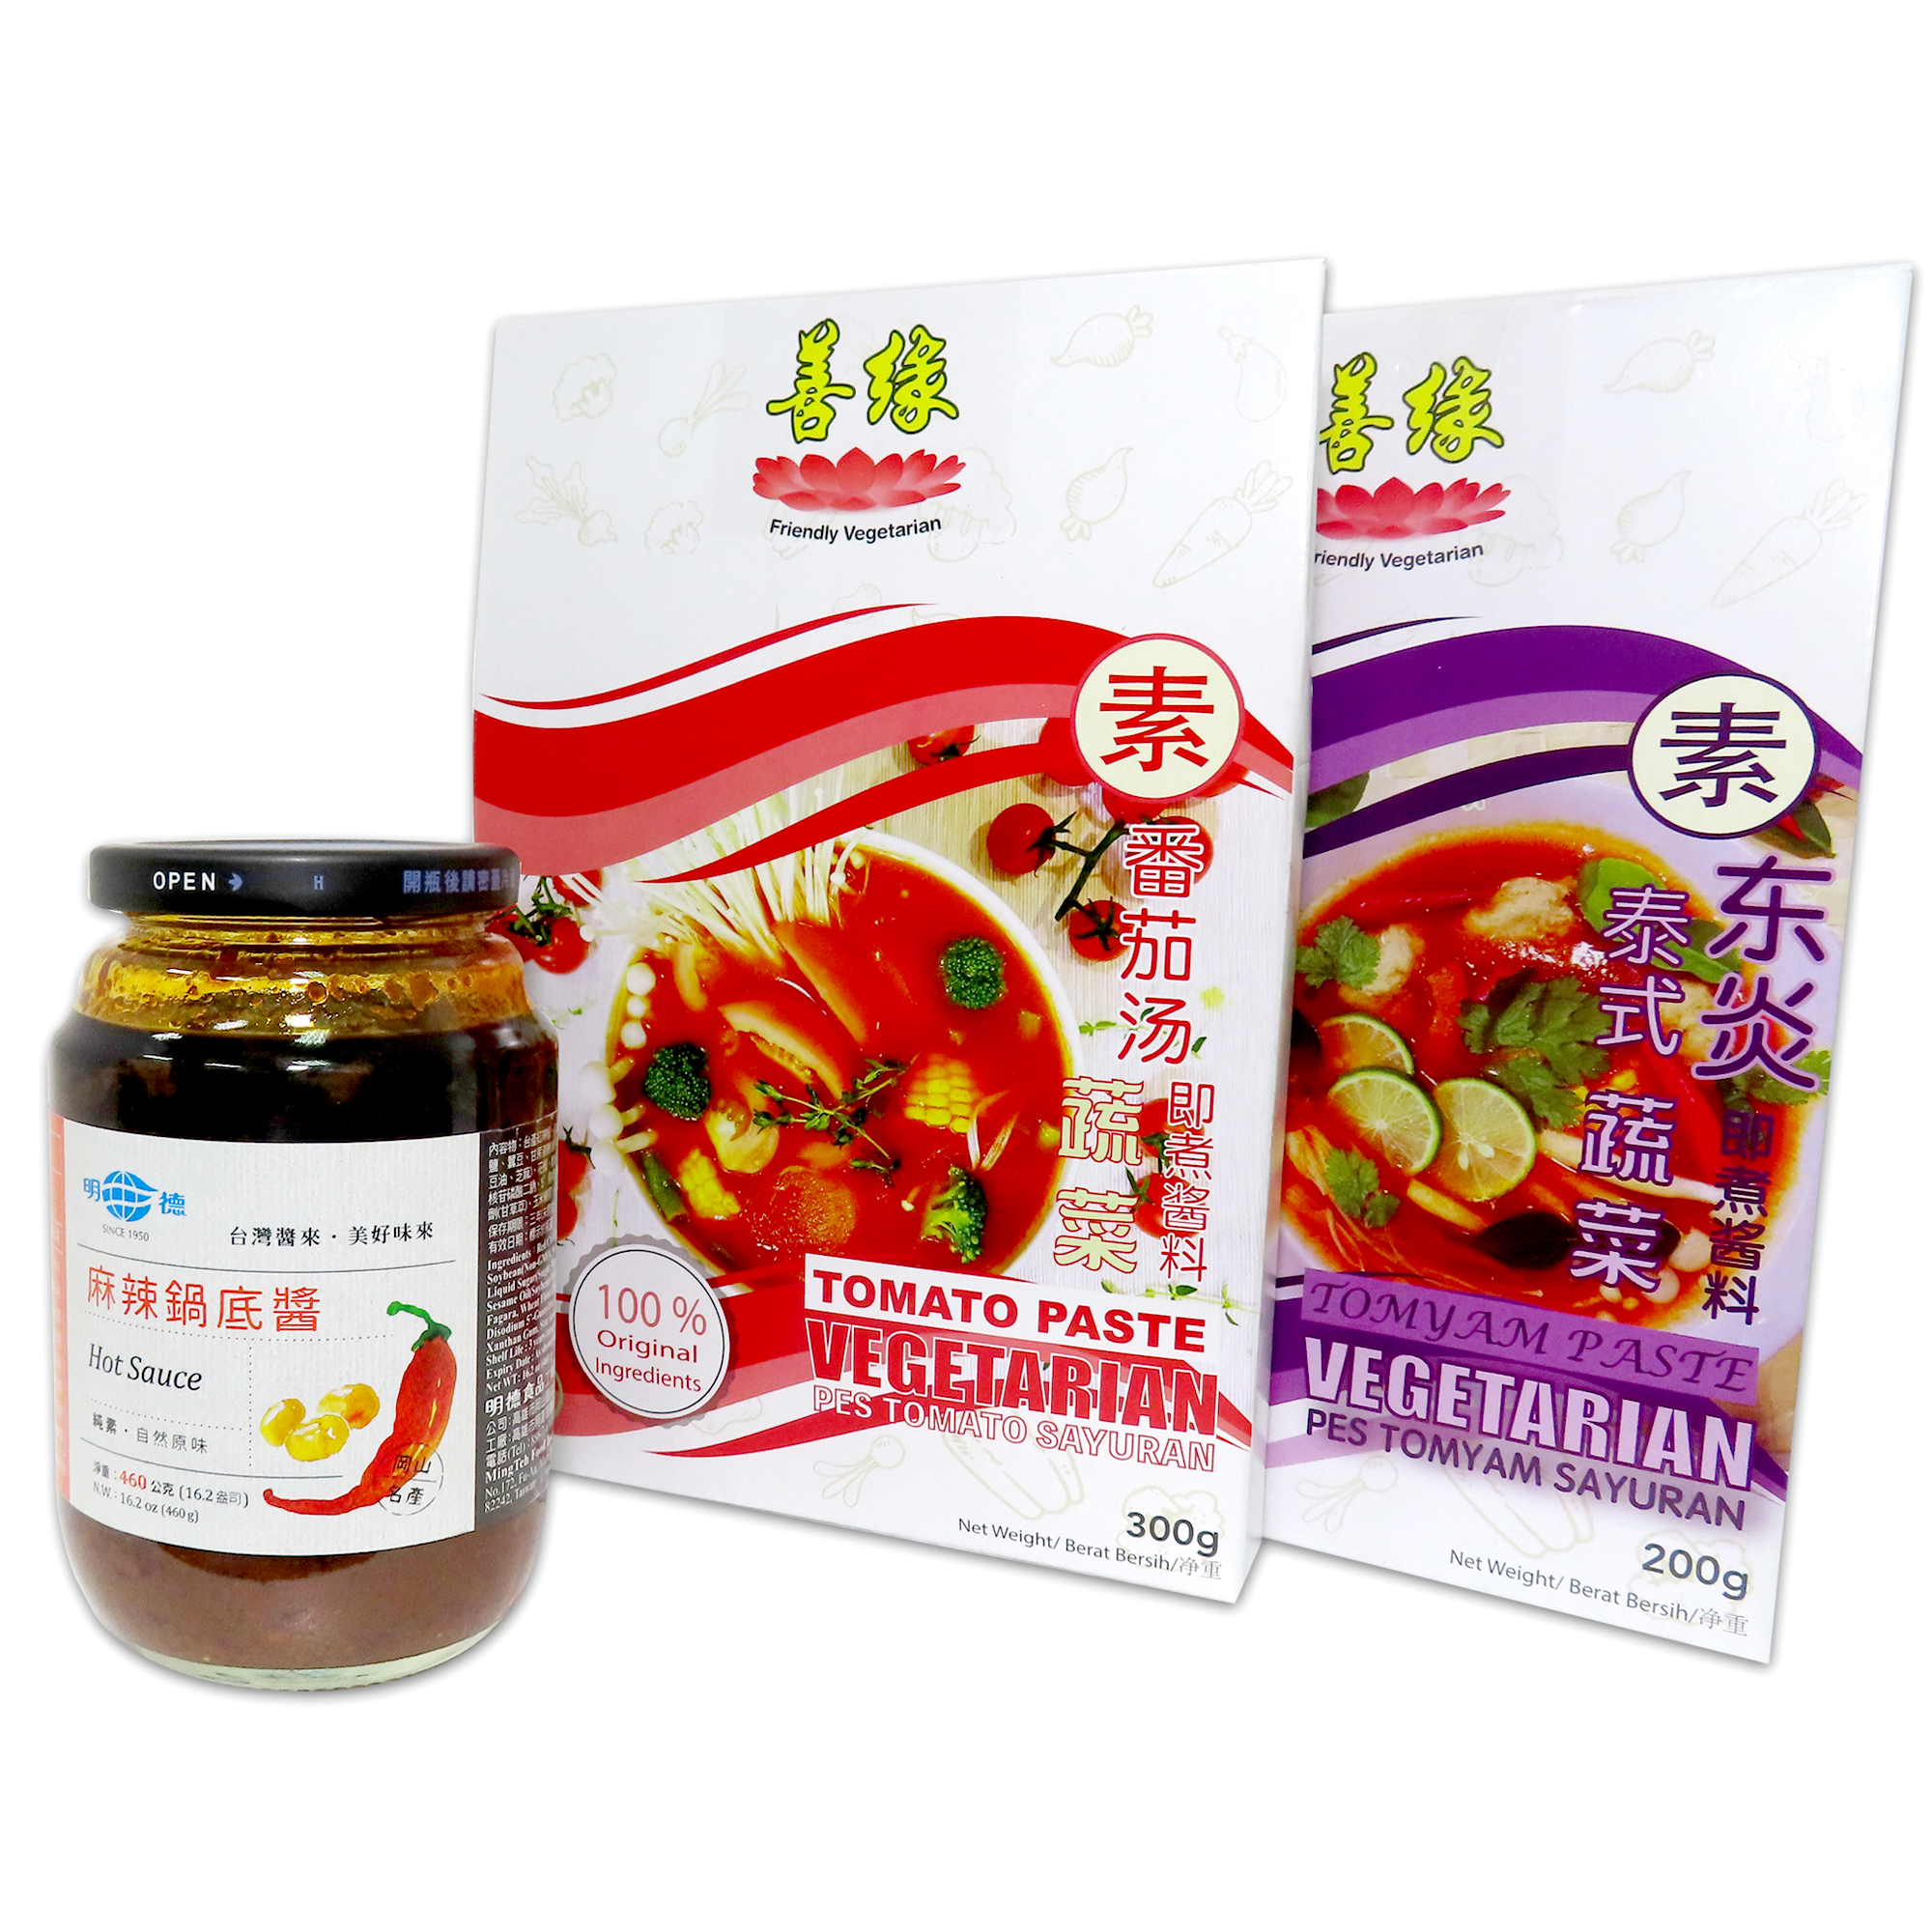 Image MT Hot Sauce, Tomato and Tomyam Soupbase Bundle 960 grams 明德麻辣酱+番茄汤+ 东炎泰式汤